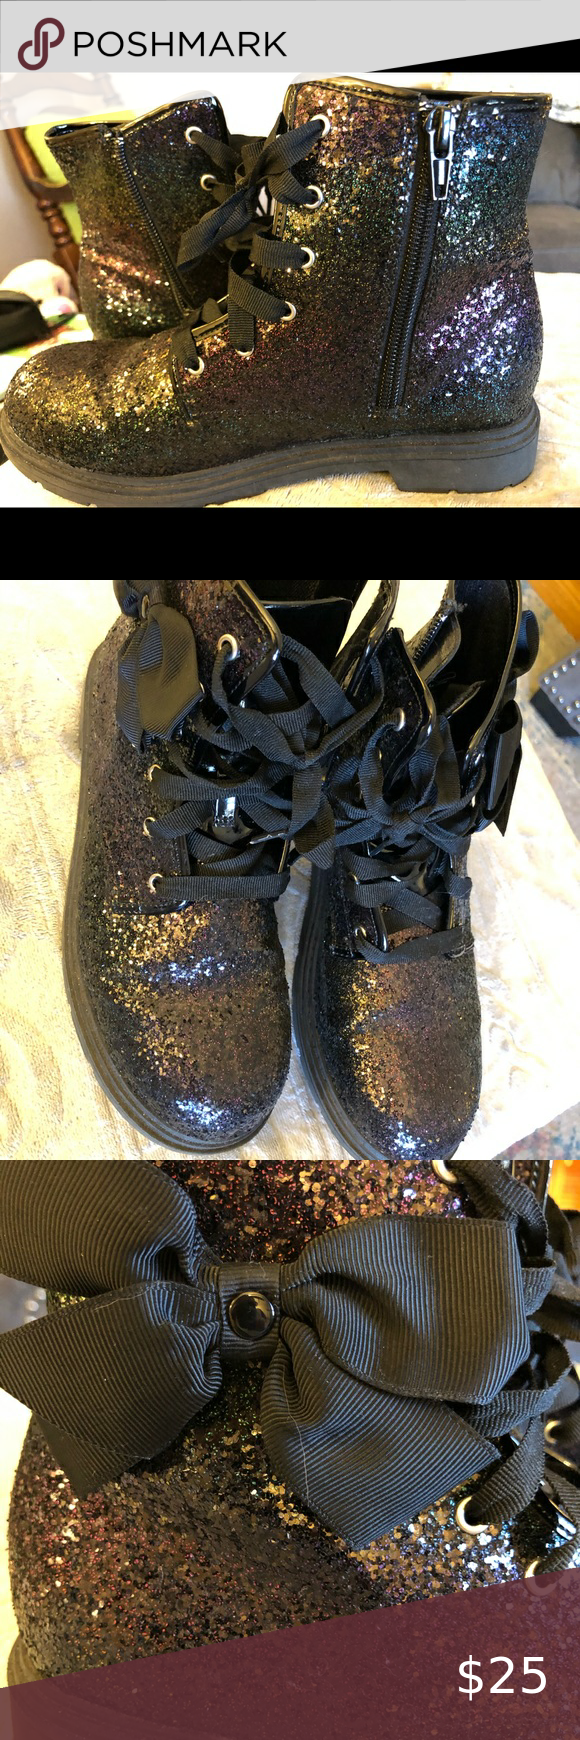 JoJo Siwa Zippered Glitter Boots in